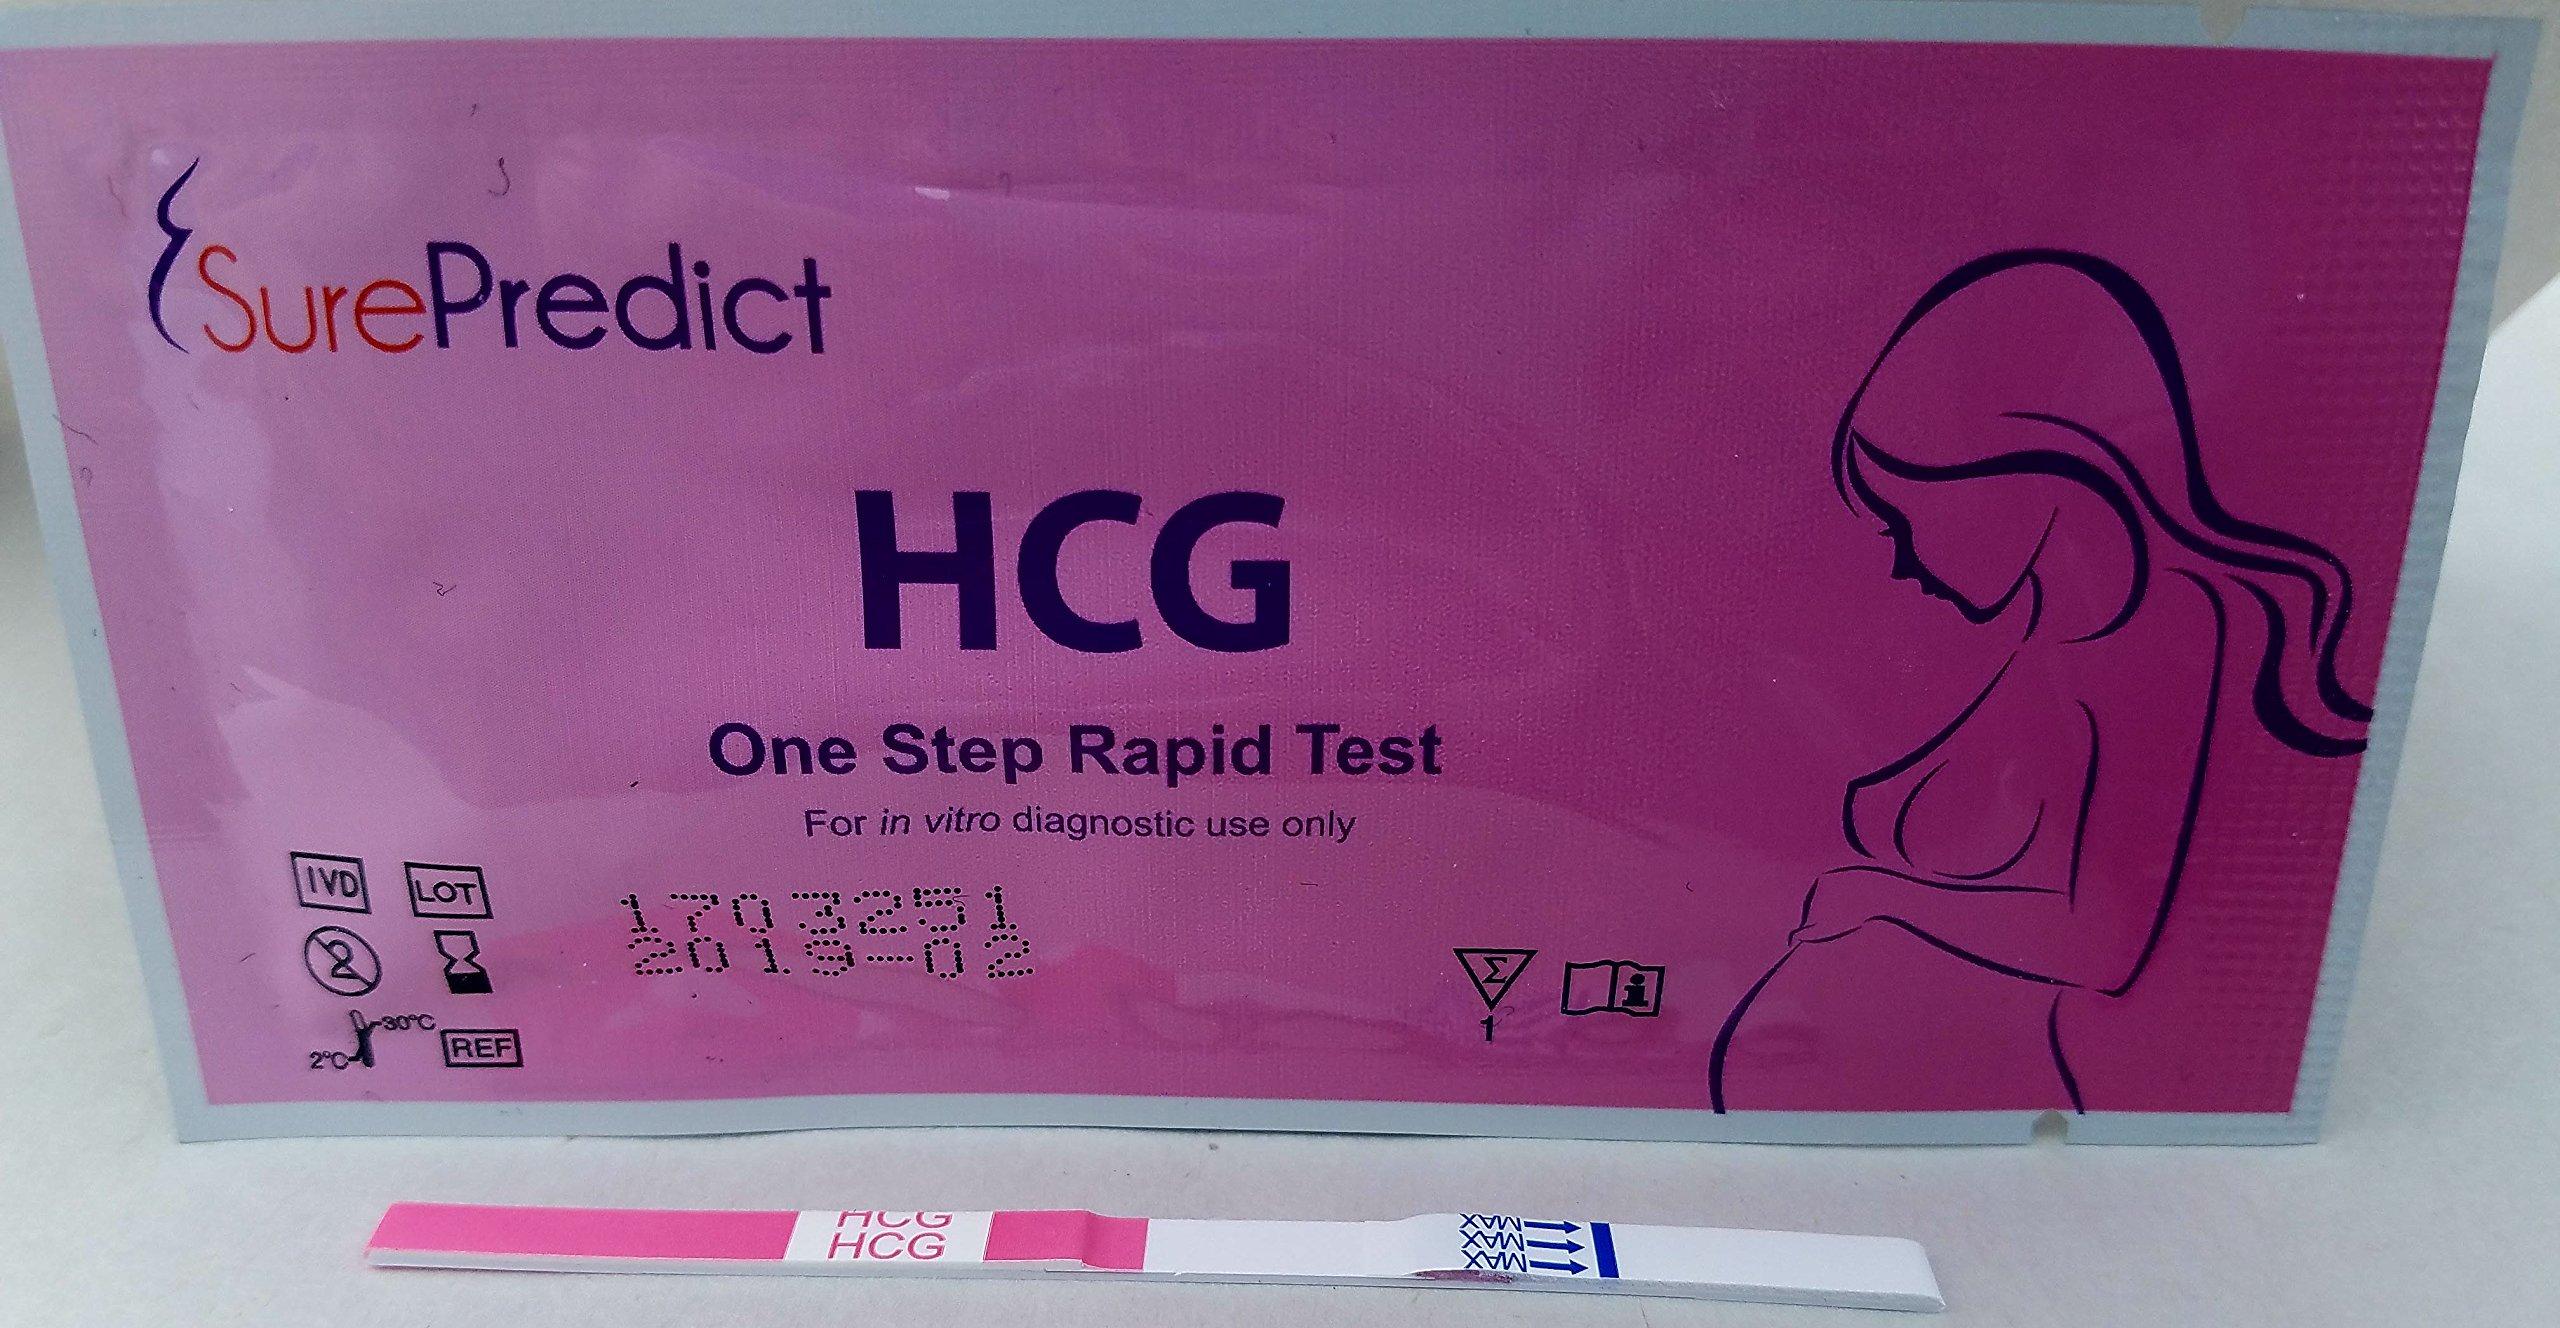 Twenty SurePredict(TM) 10mIU Super Early HcG Pregnancy Tests